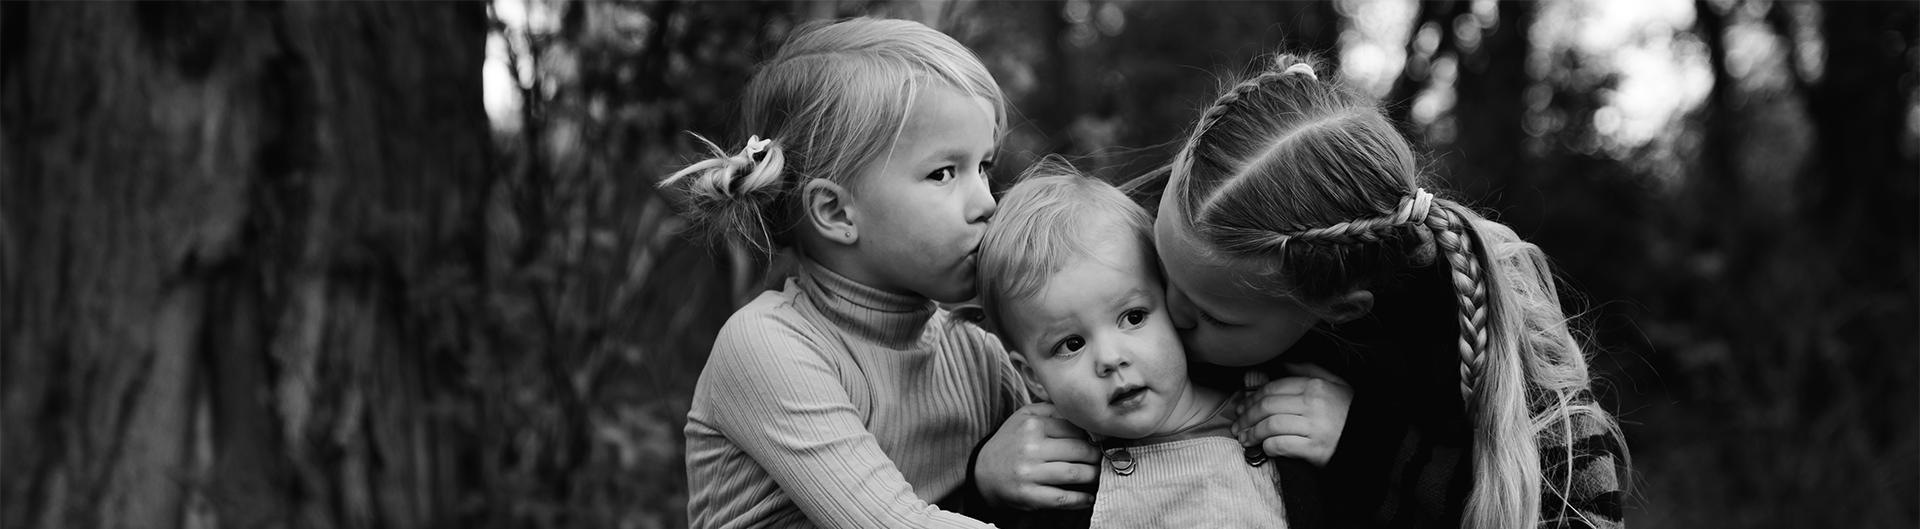 MessyMommy mama van 3 girls